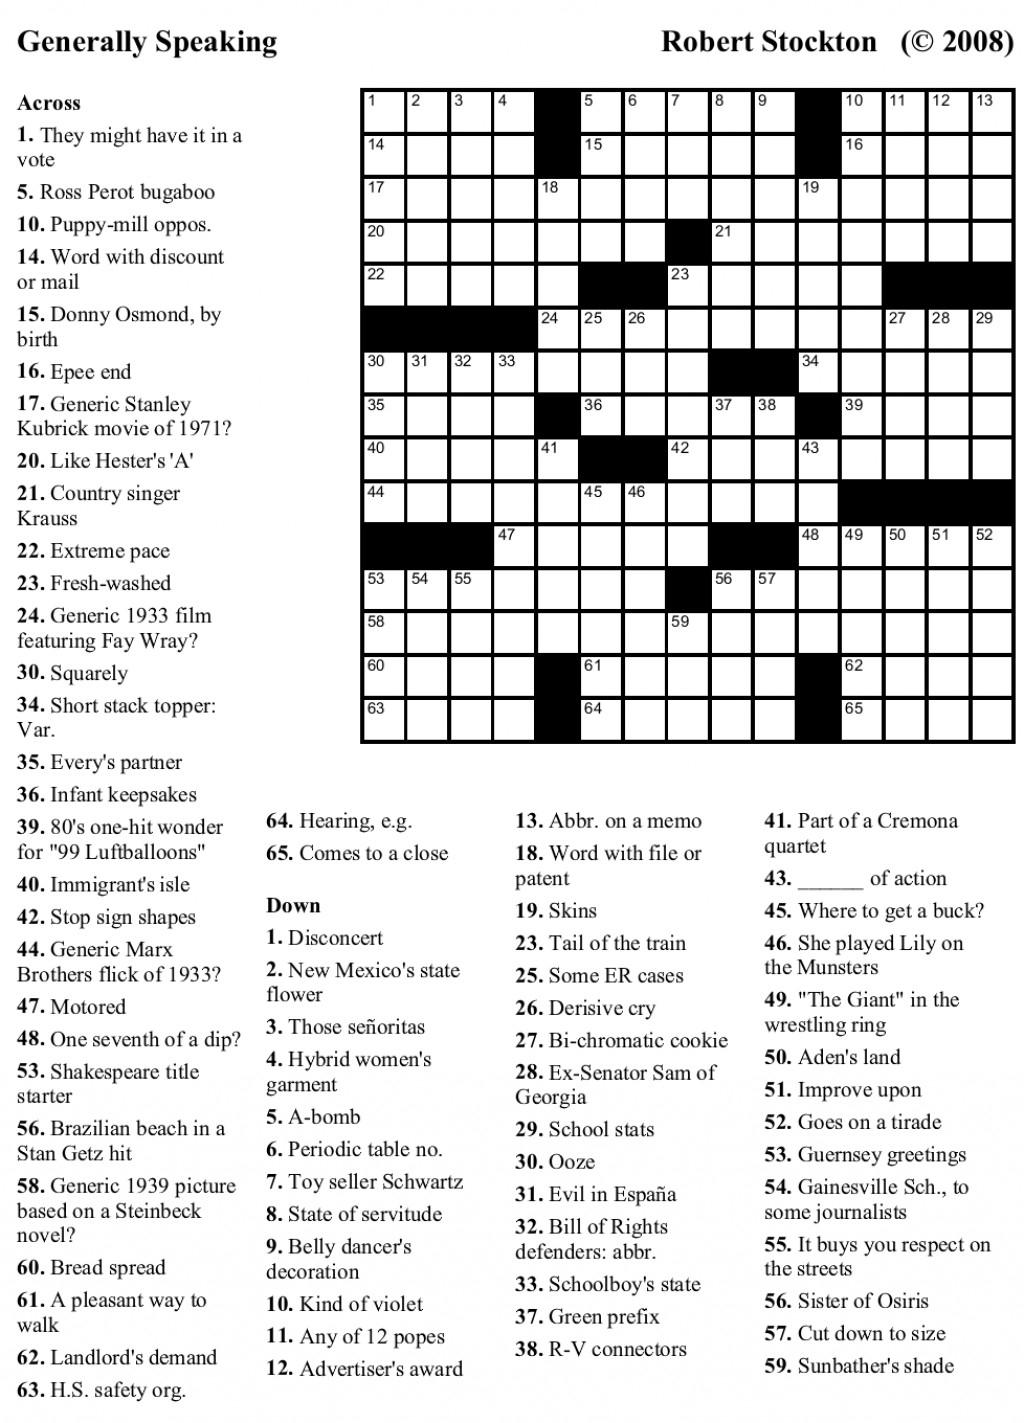 Crossword Puzzles Challenging Printable Crosswords Generallyspeaking - Free Printable Crossword Puzzles Medium Difficulty